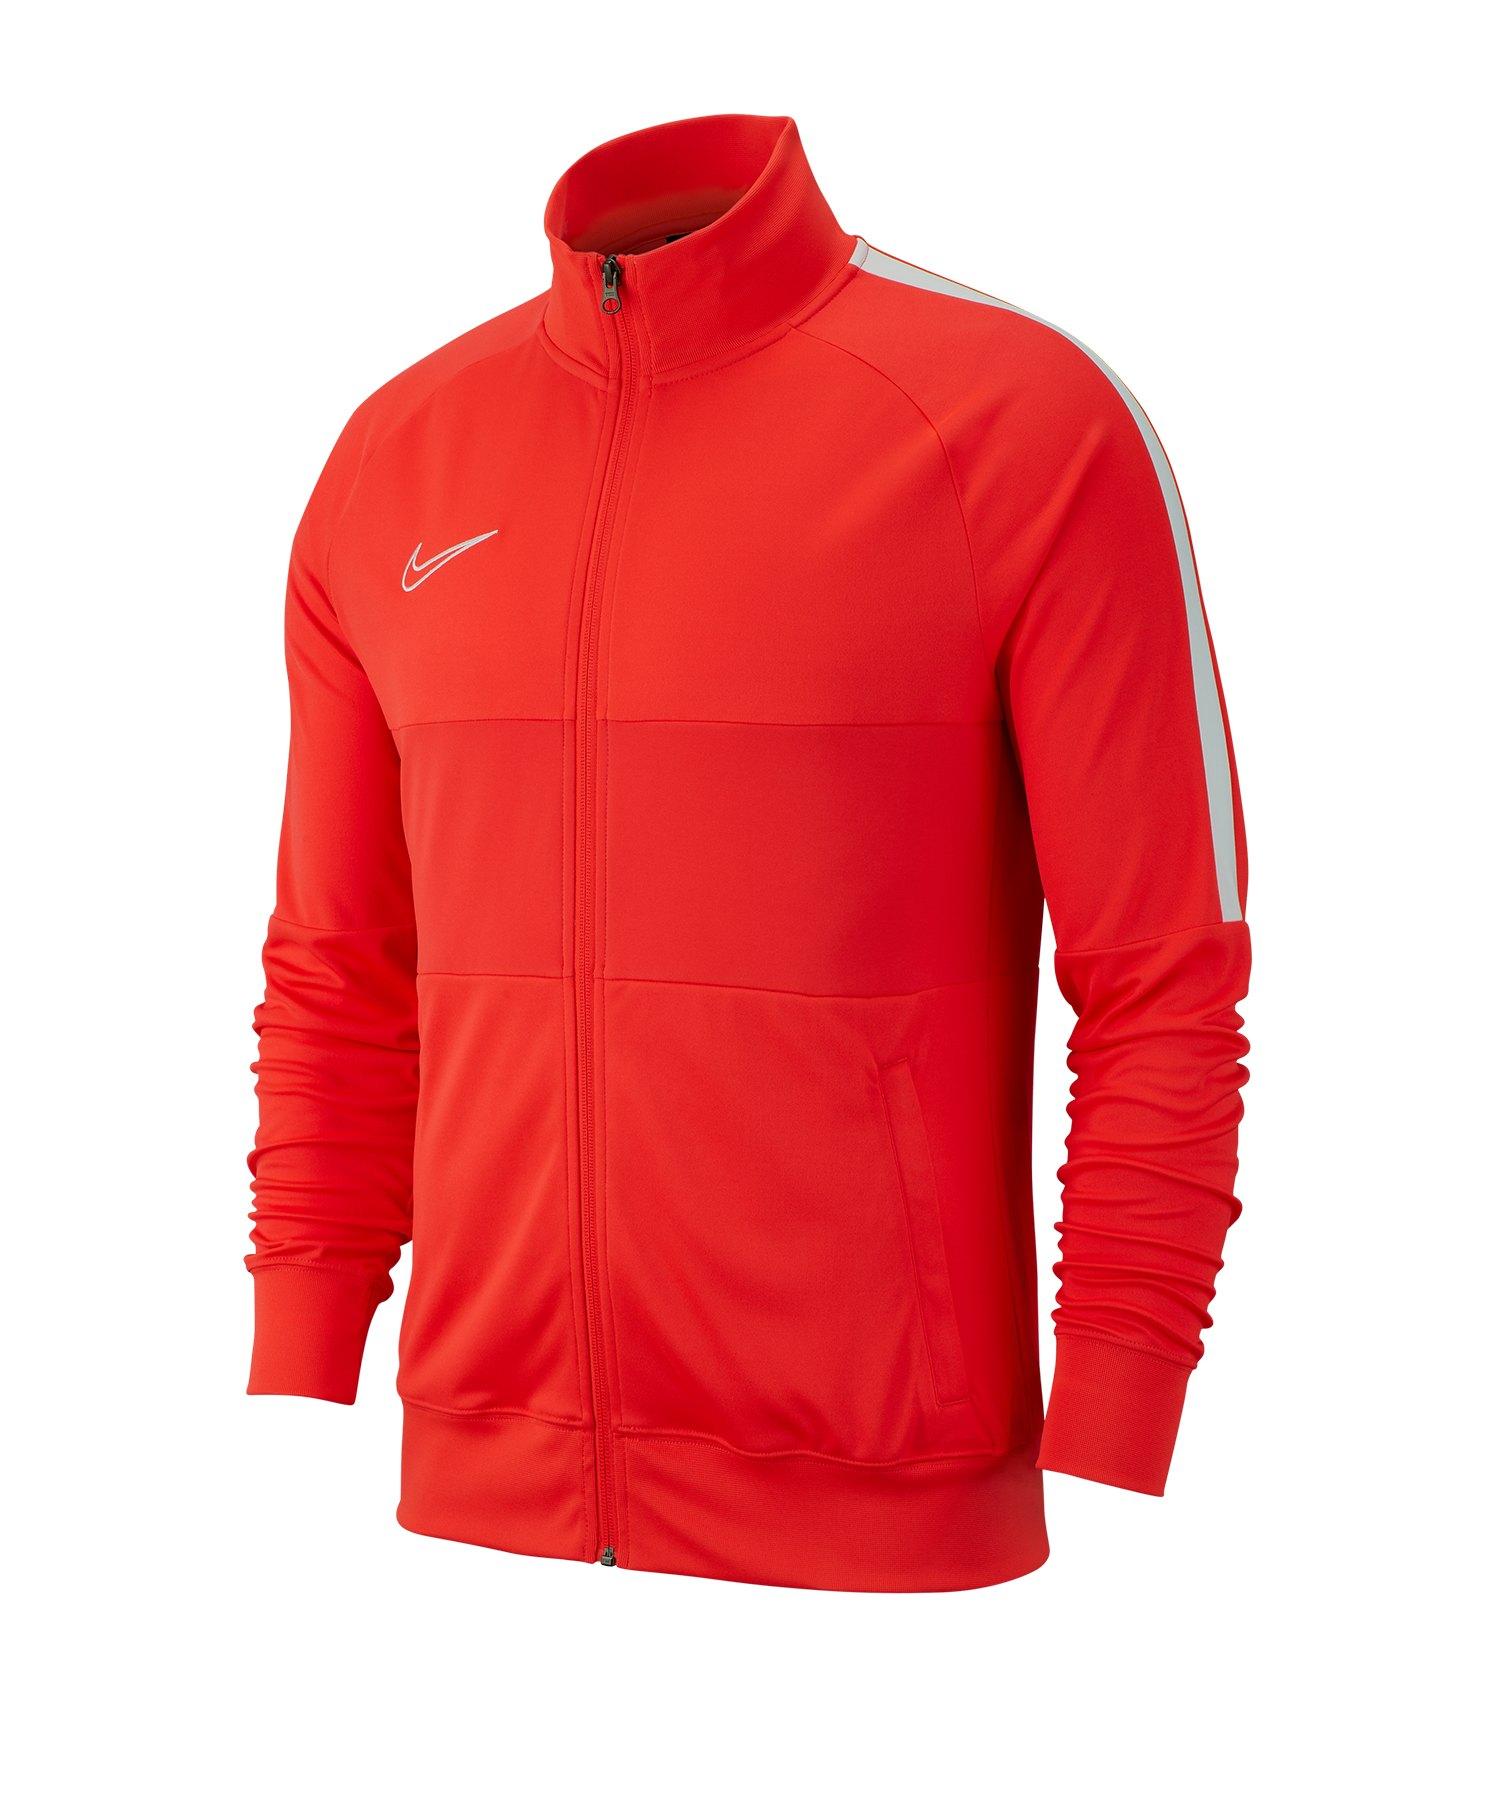 Nike Academy 19 Dri-FIT Jacke Kids Orange F671 - orange